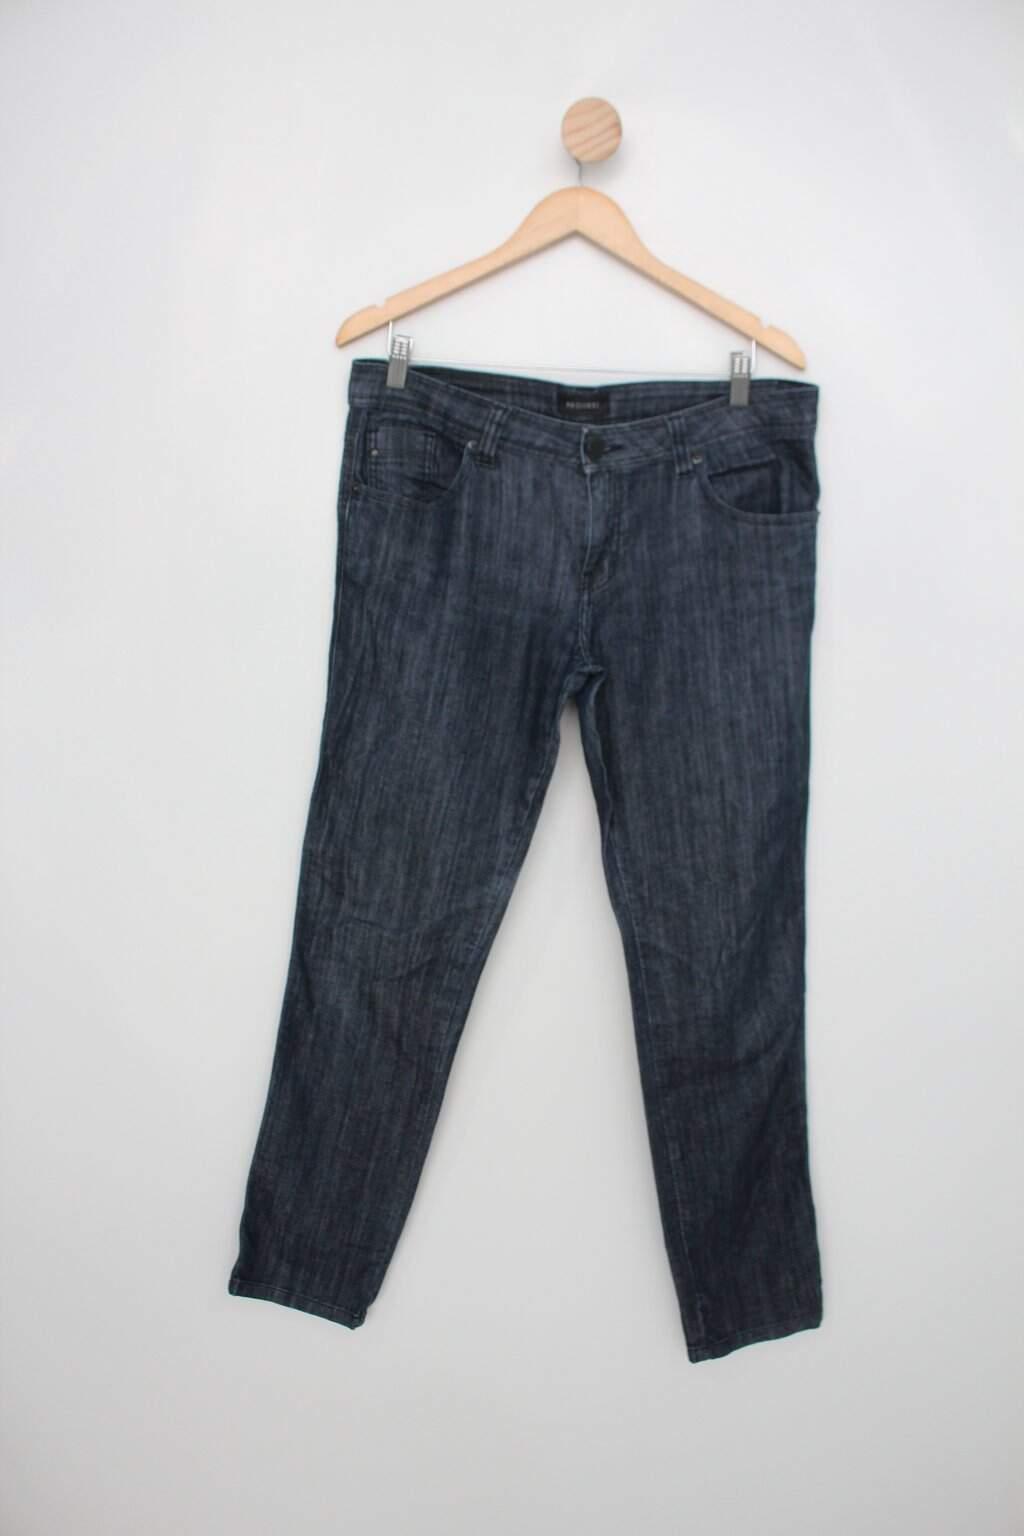 Calça Jeans Slim Renner Feminina Azul Marinho